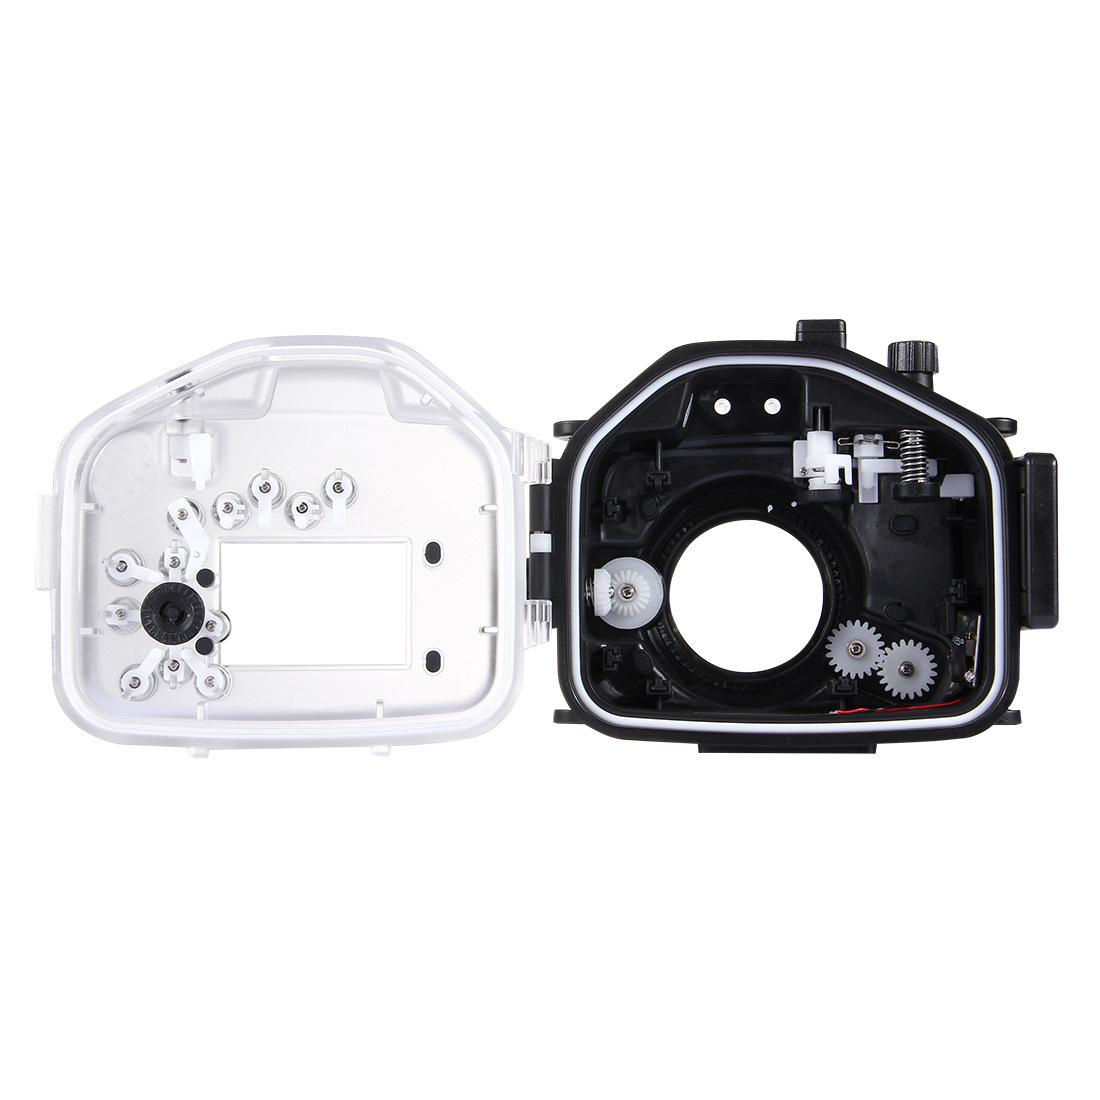 PULUZ胖牛松下DMC-LX100相机潜水壳保护箱 专业水下摄影防水罩/壳